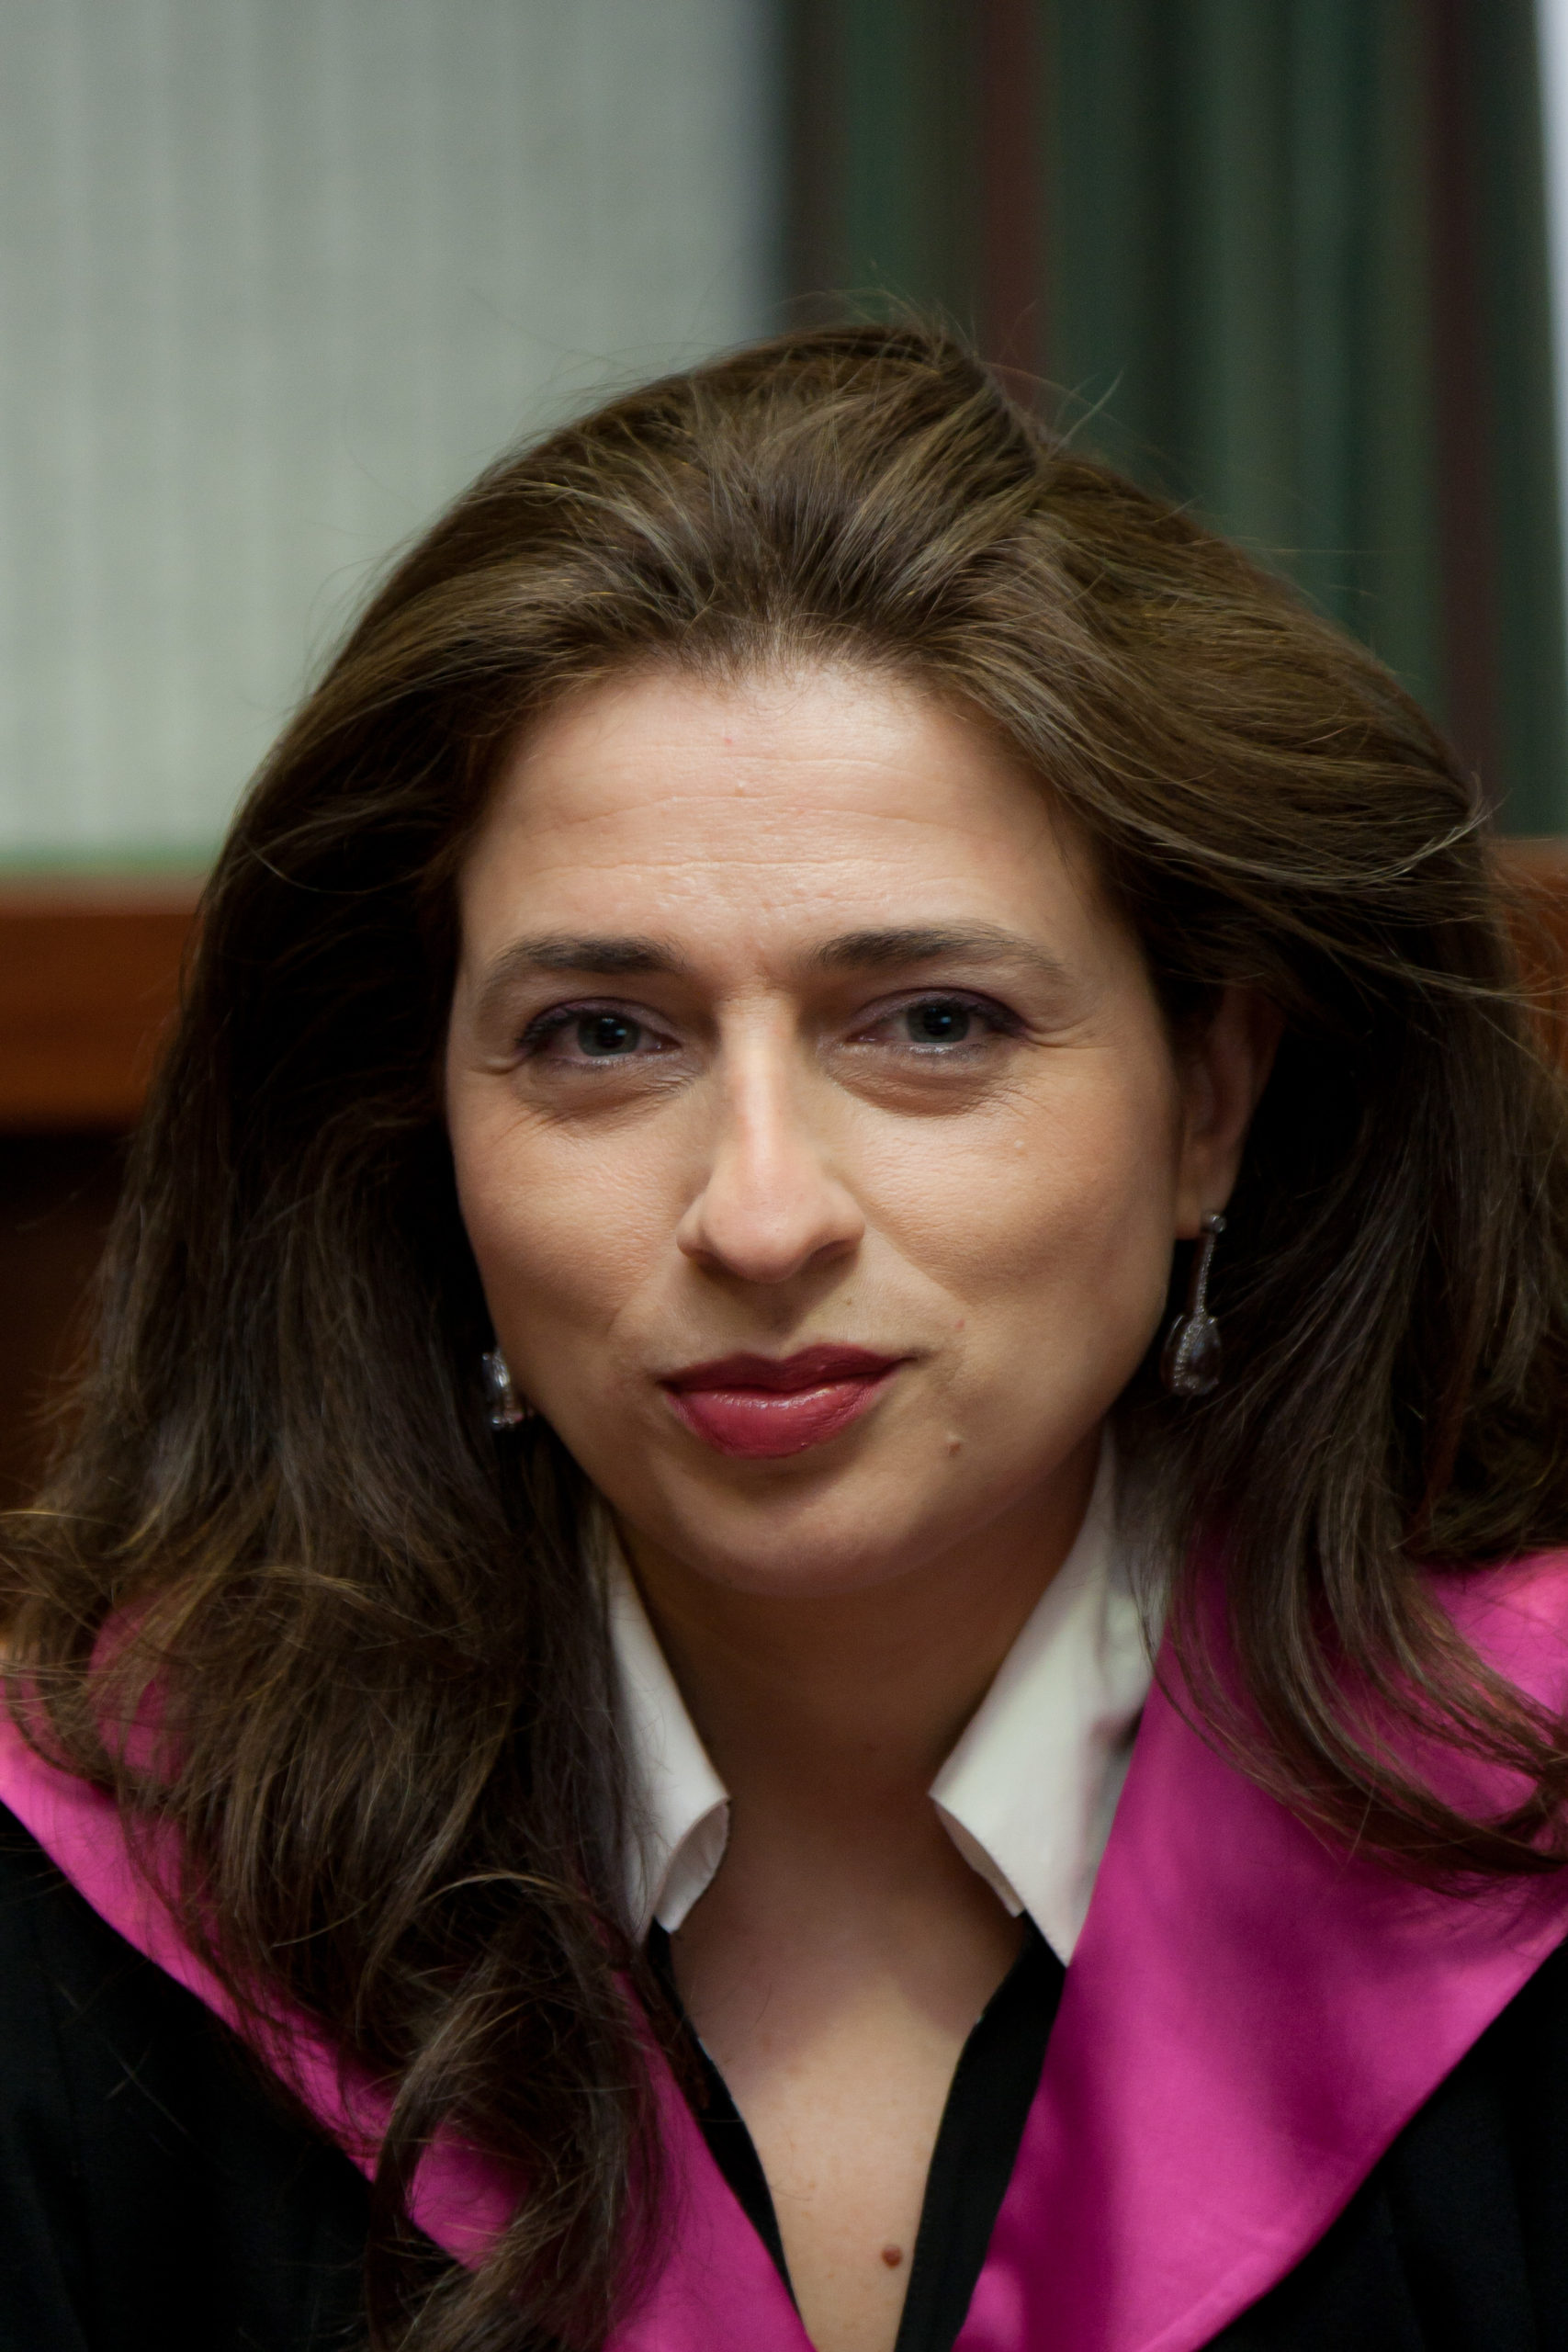 Avv. Katia Belvedere